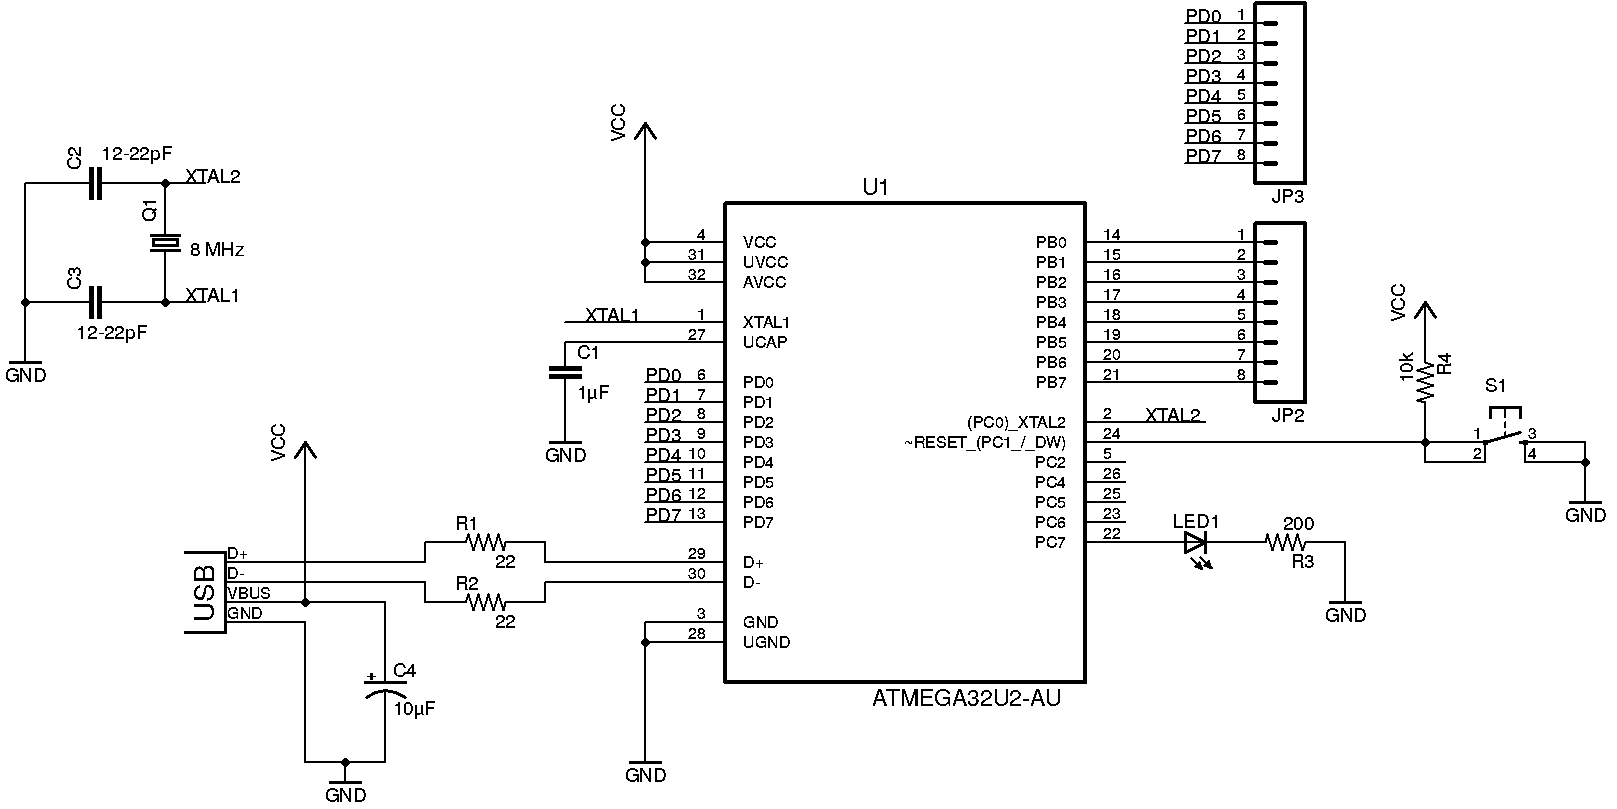 ATmega32U2 circuit diagram | Arduino | Pinterest | Circuit diagram ...